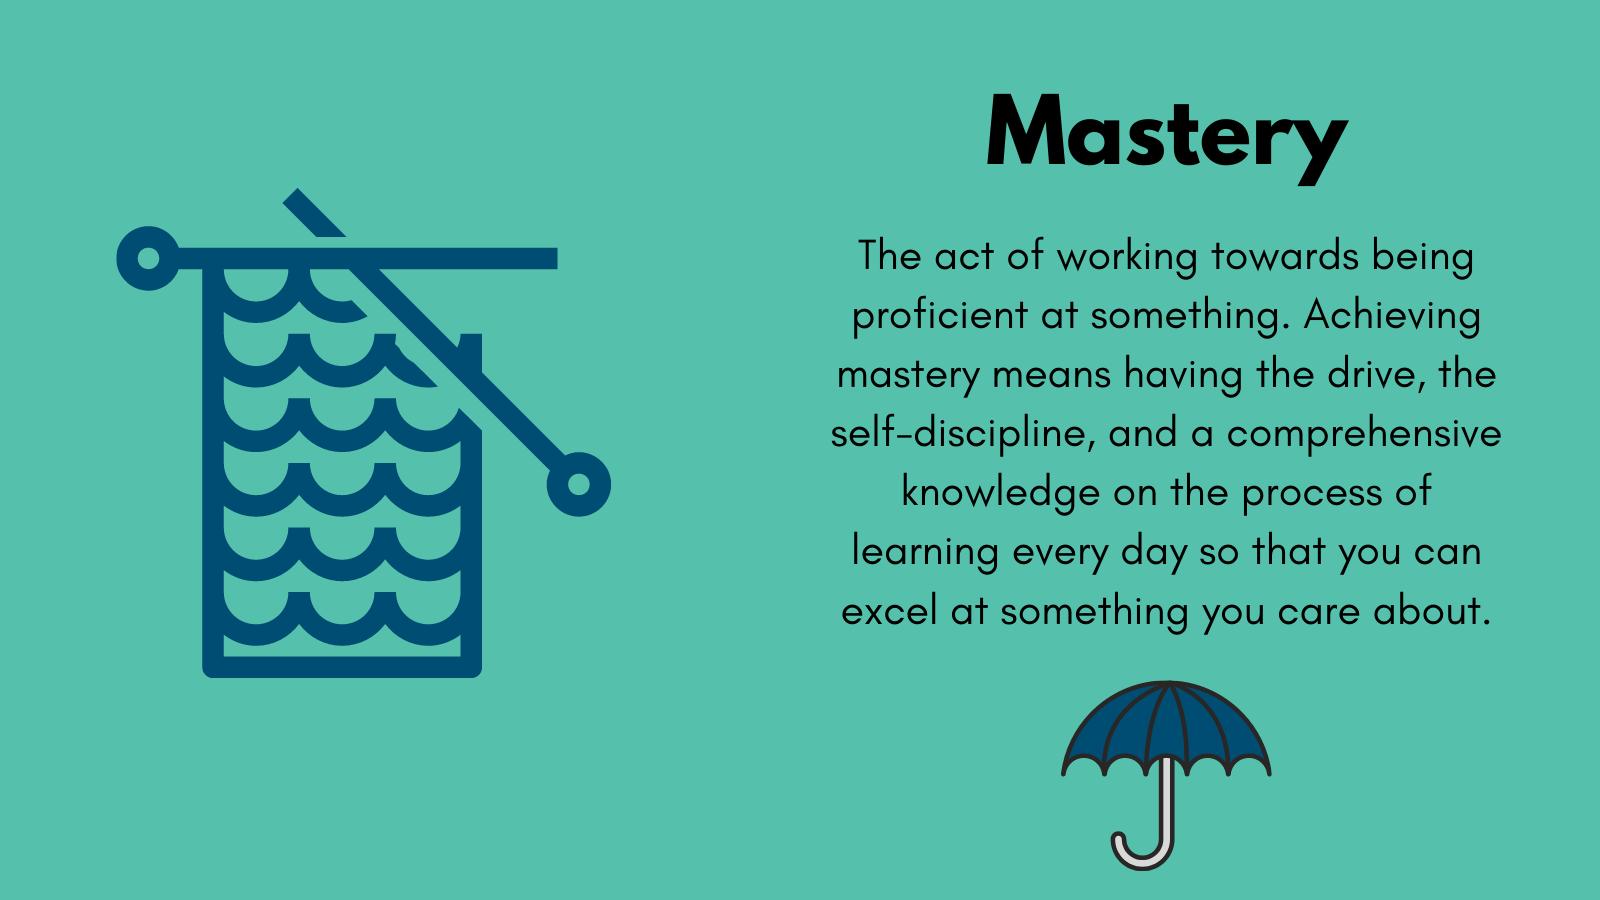 June Mastery